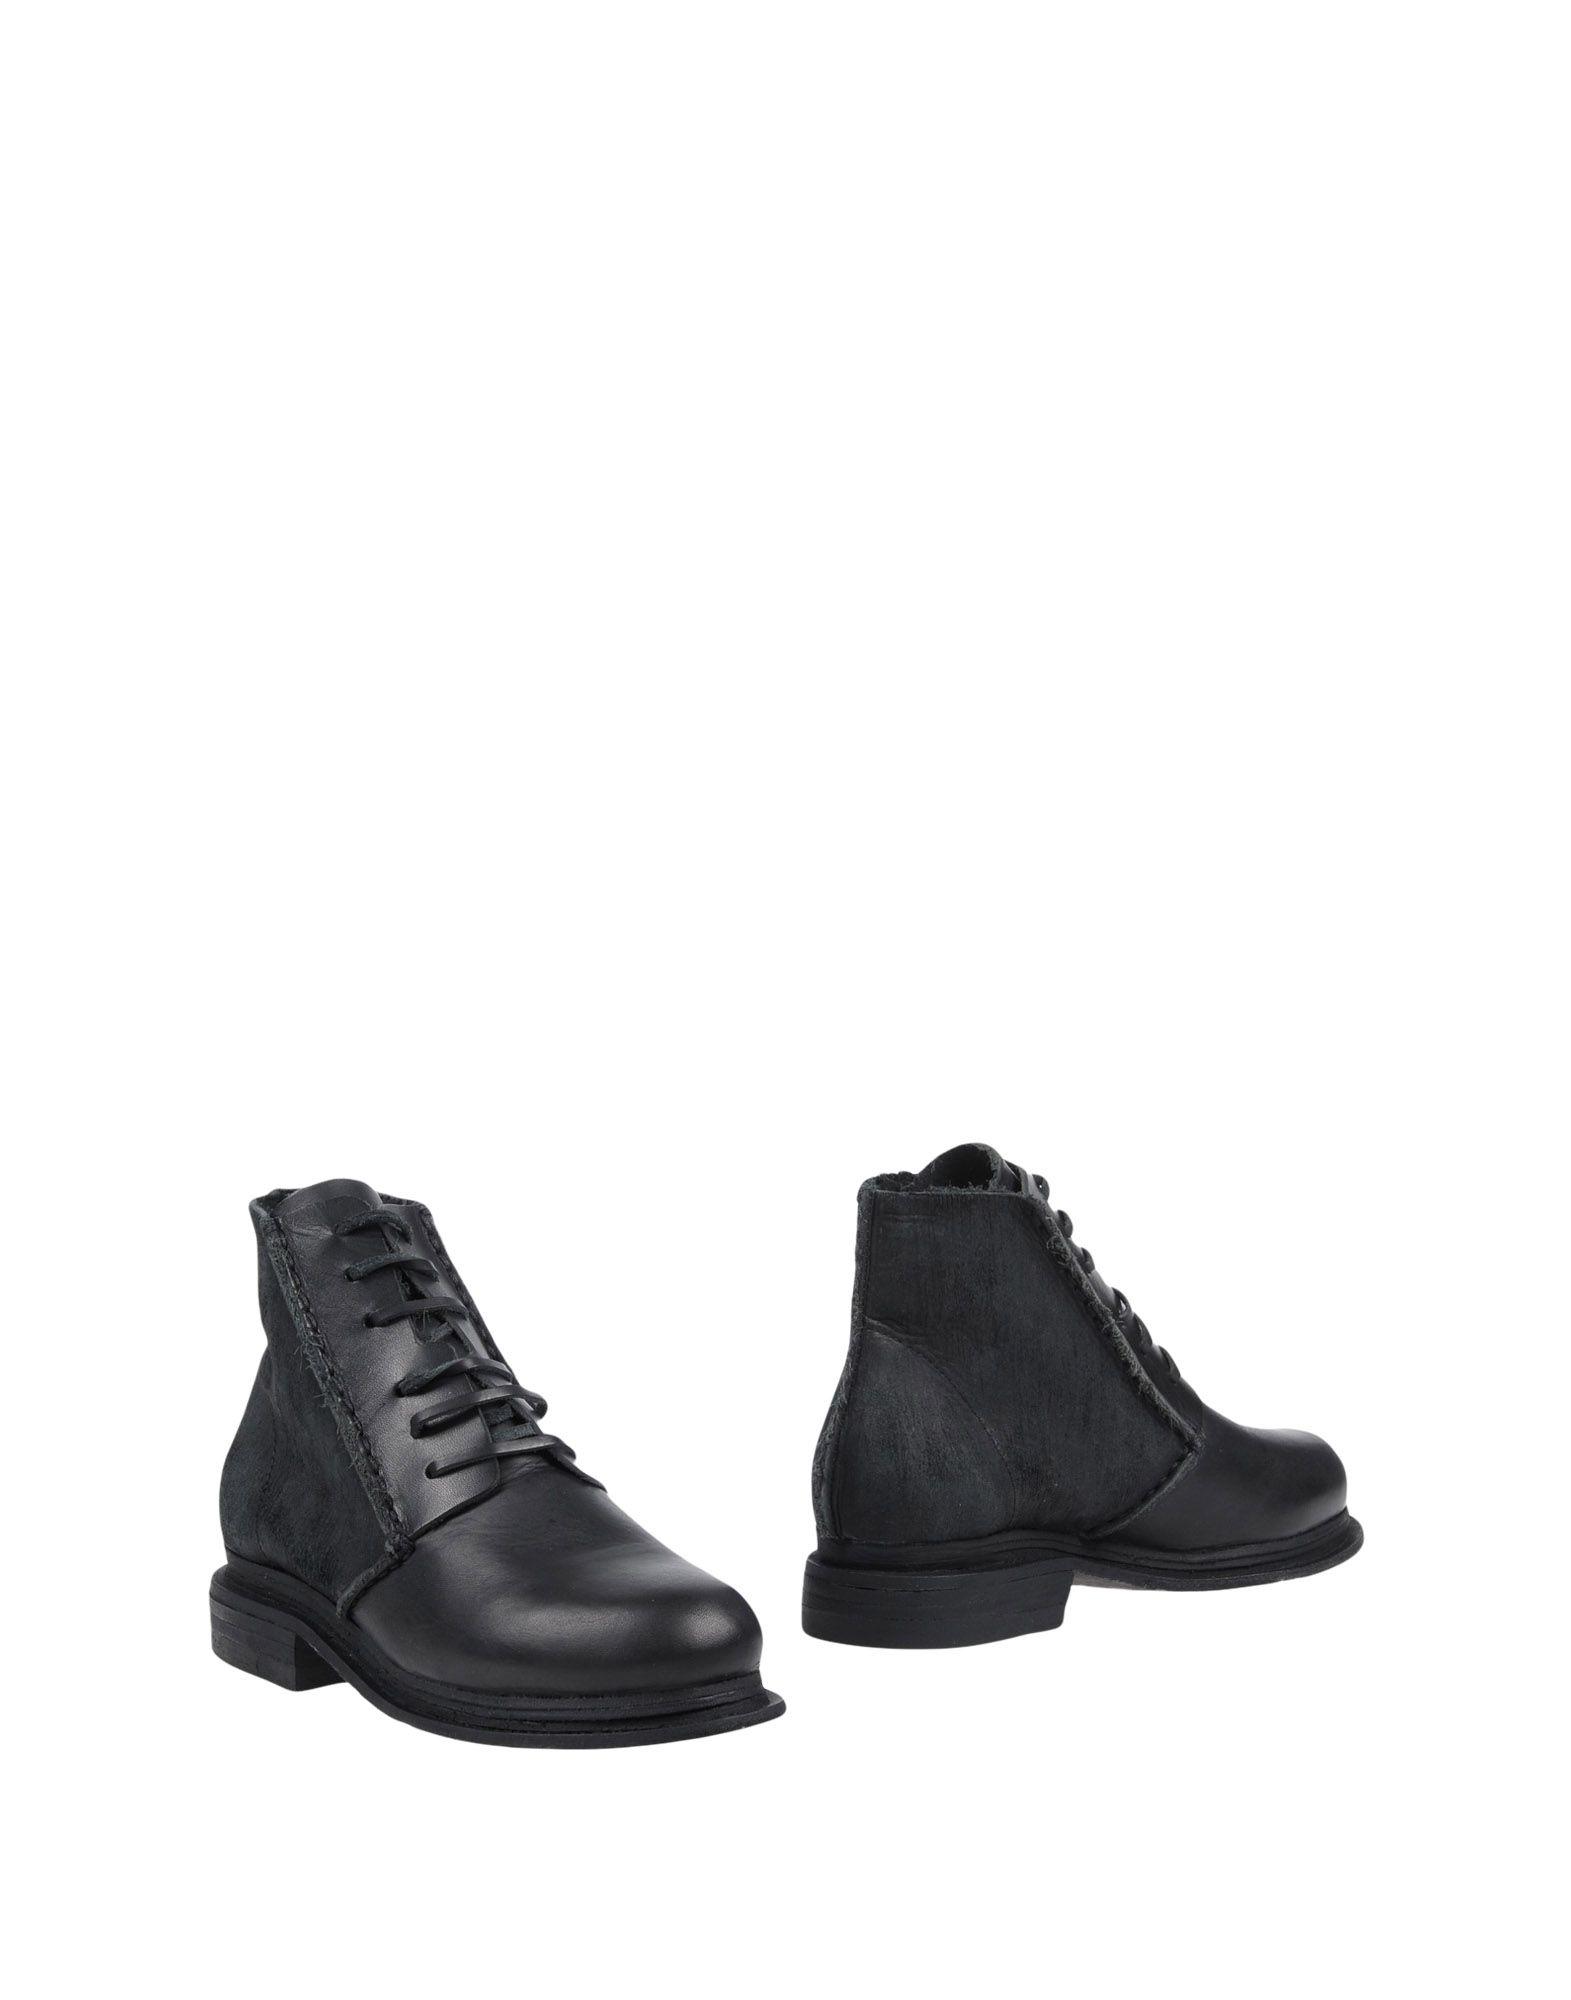 Petrucha gut Stiefelette Damen  11436890LGGünstige gut Petrucha aussehende Schuhe 082c6e